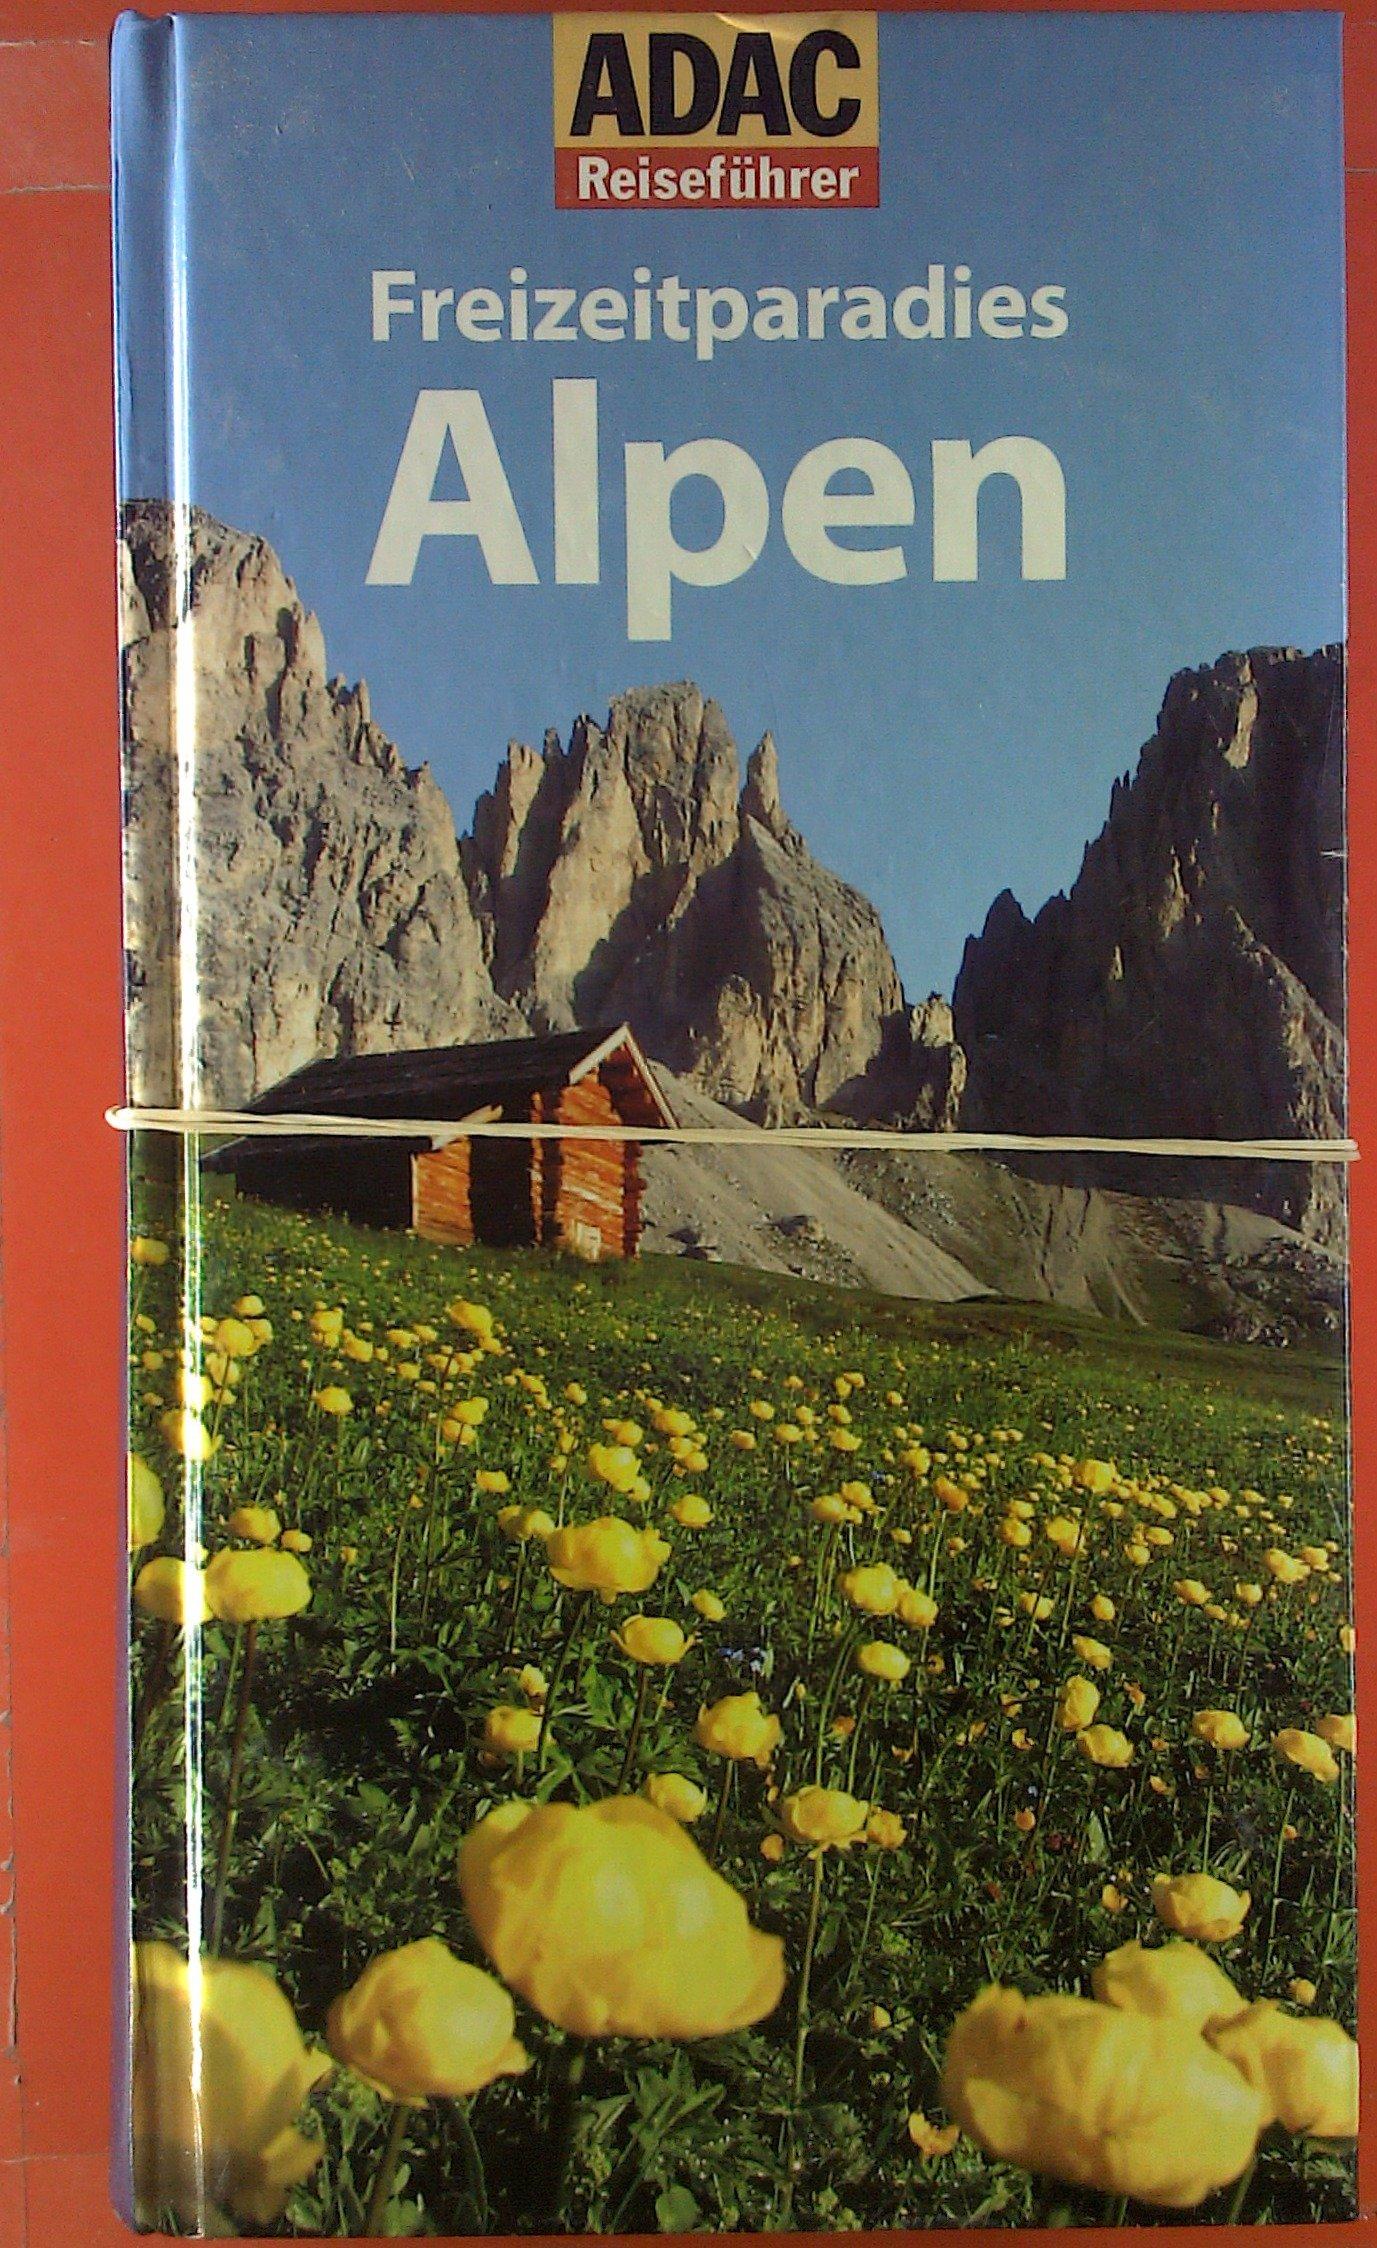 die alpen sehnsuchtsort heimatidyll naturlandschaft